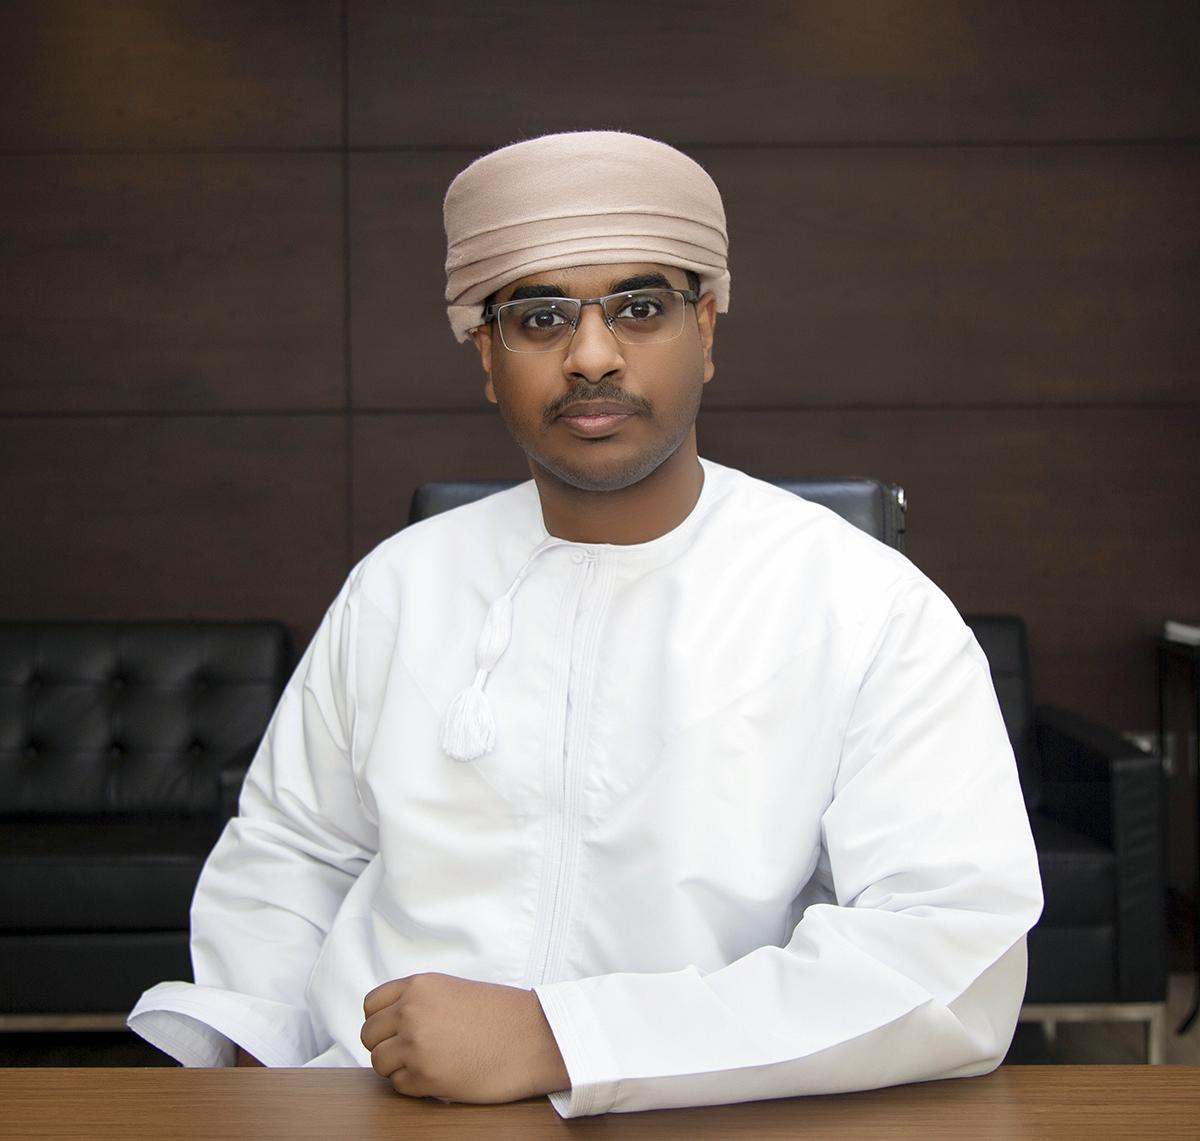 Salim Al Harthi